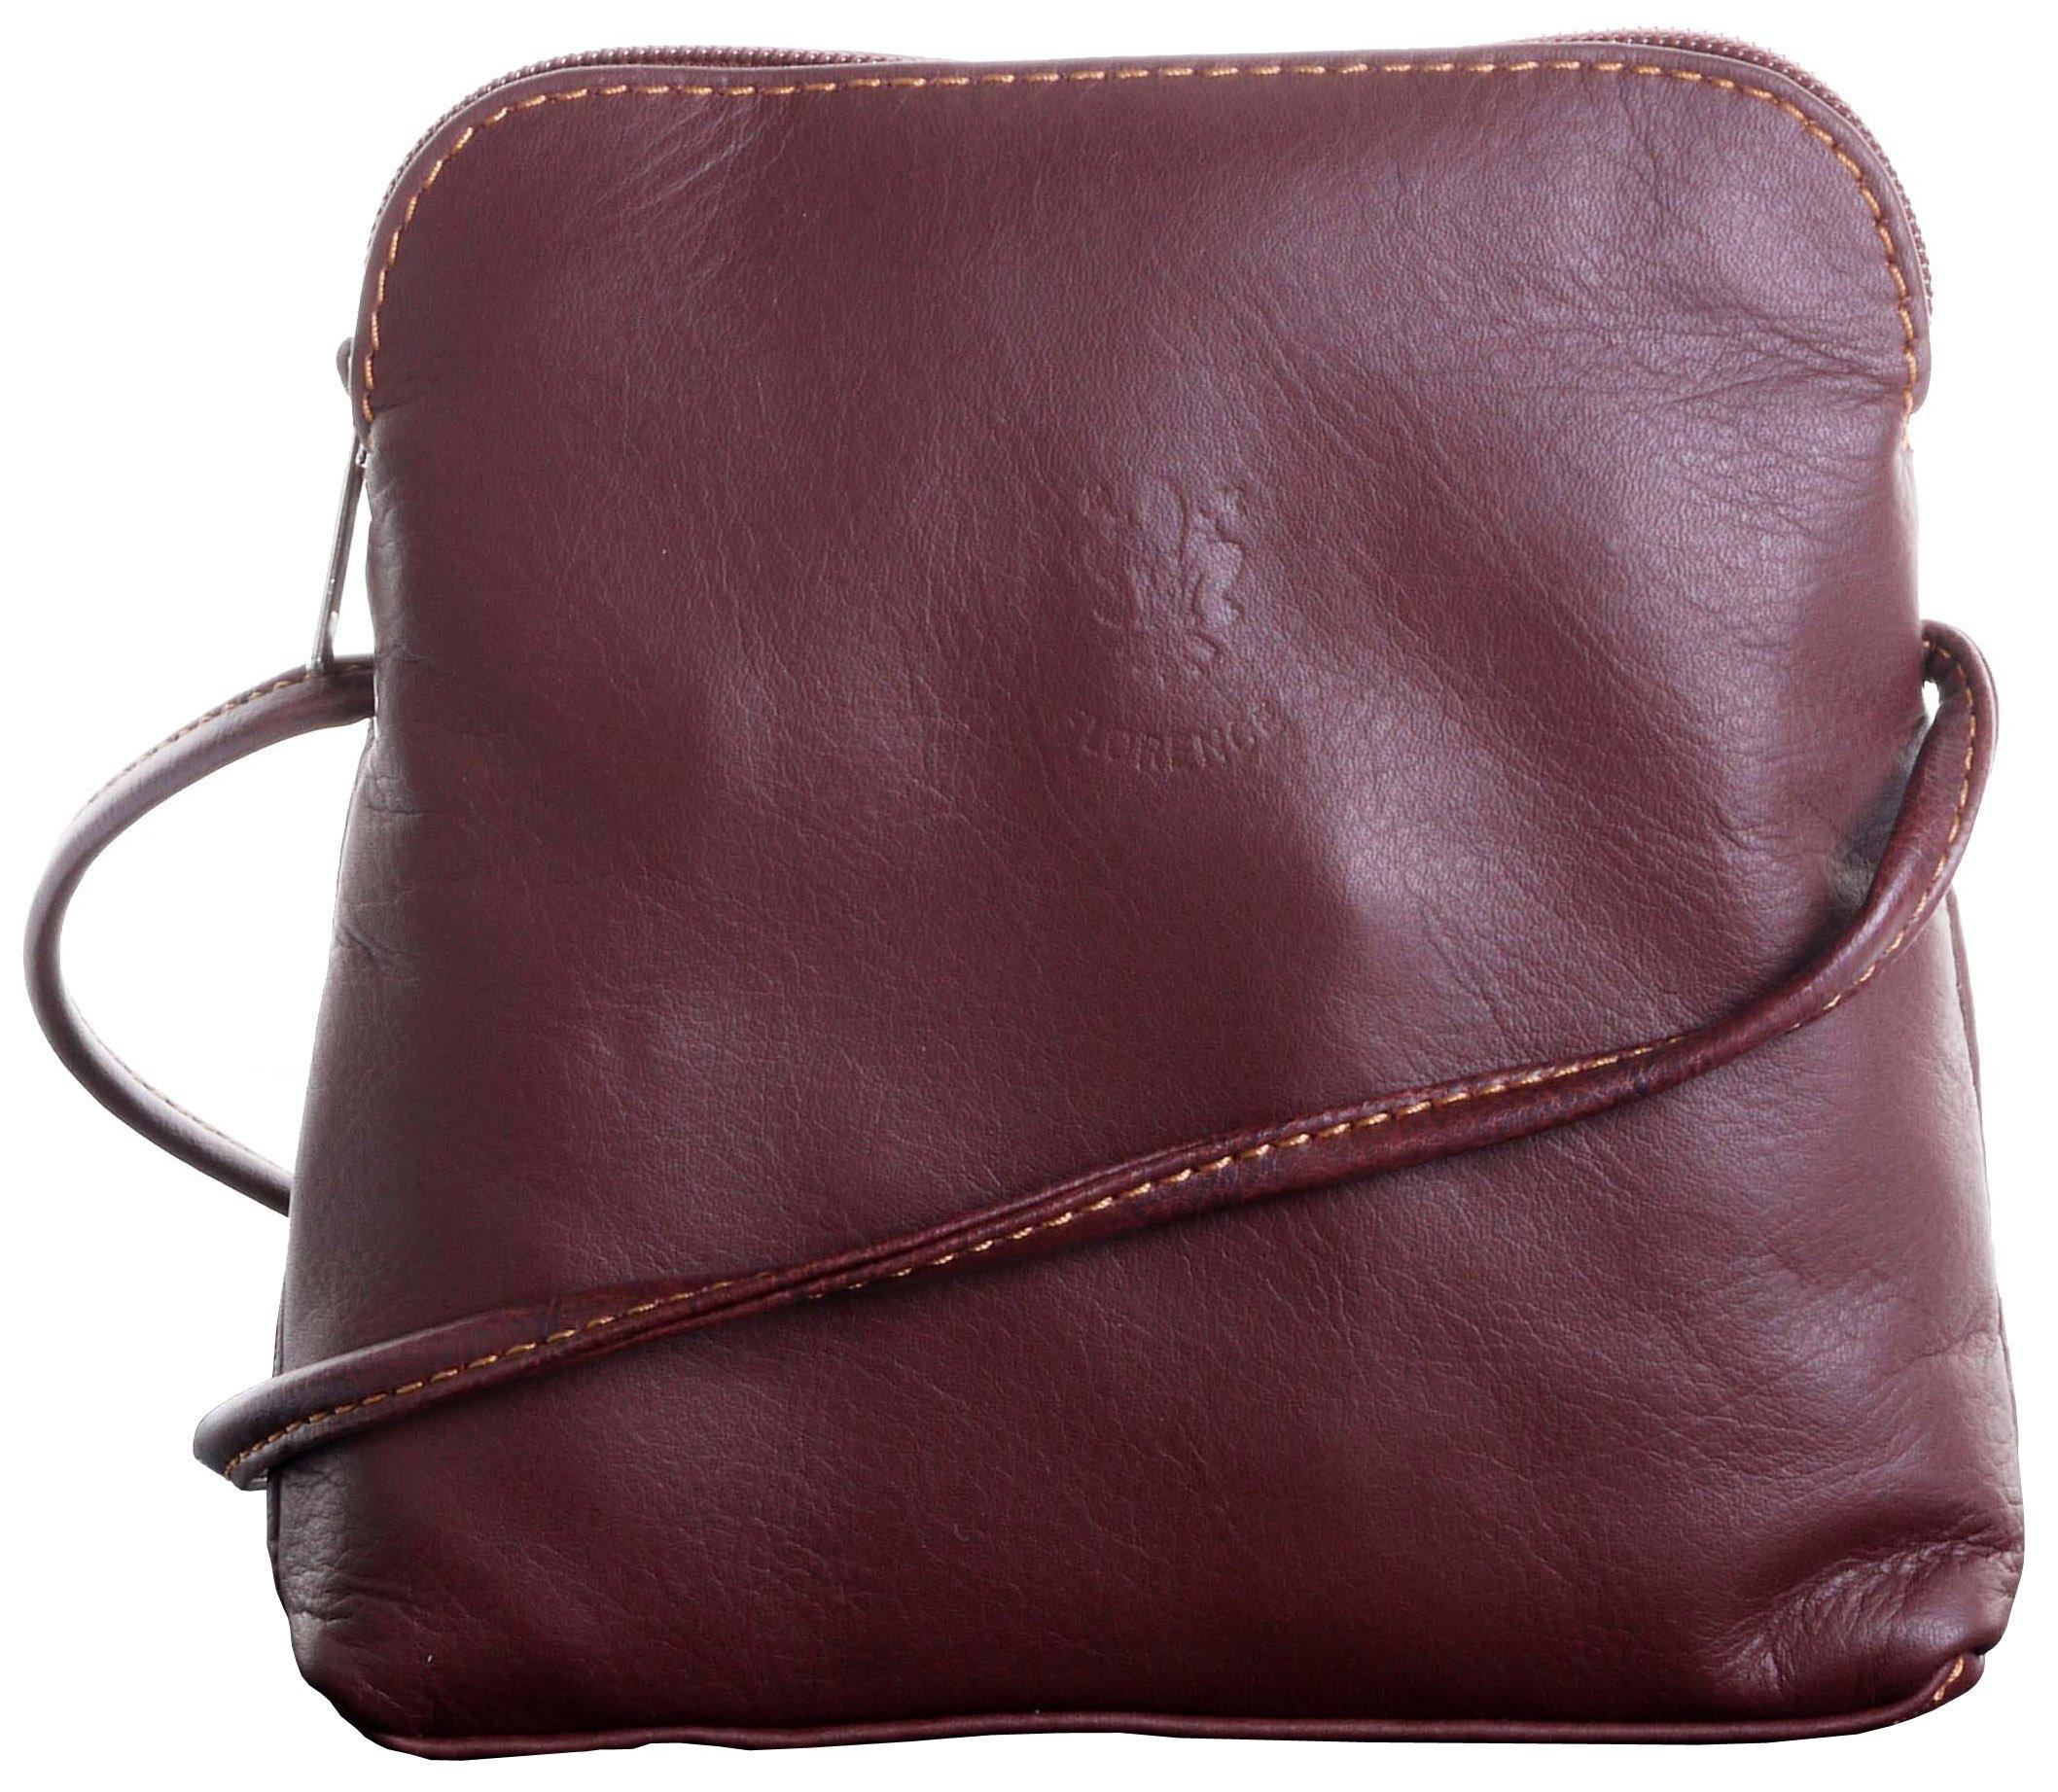 ad0344b8eb36 Primo Sacchi® Italian Soft Leather Hand Made Small Micro Cross Body  Shoulder Bag Handbag